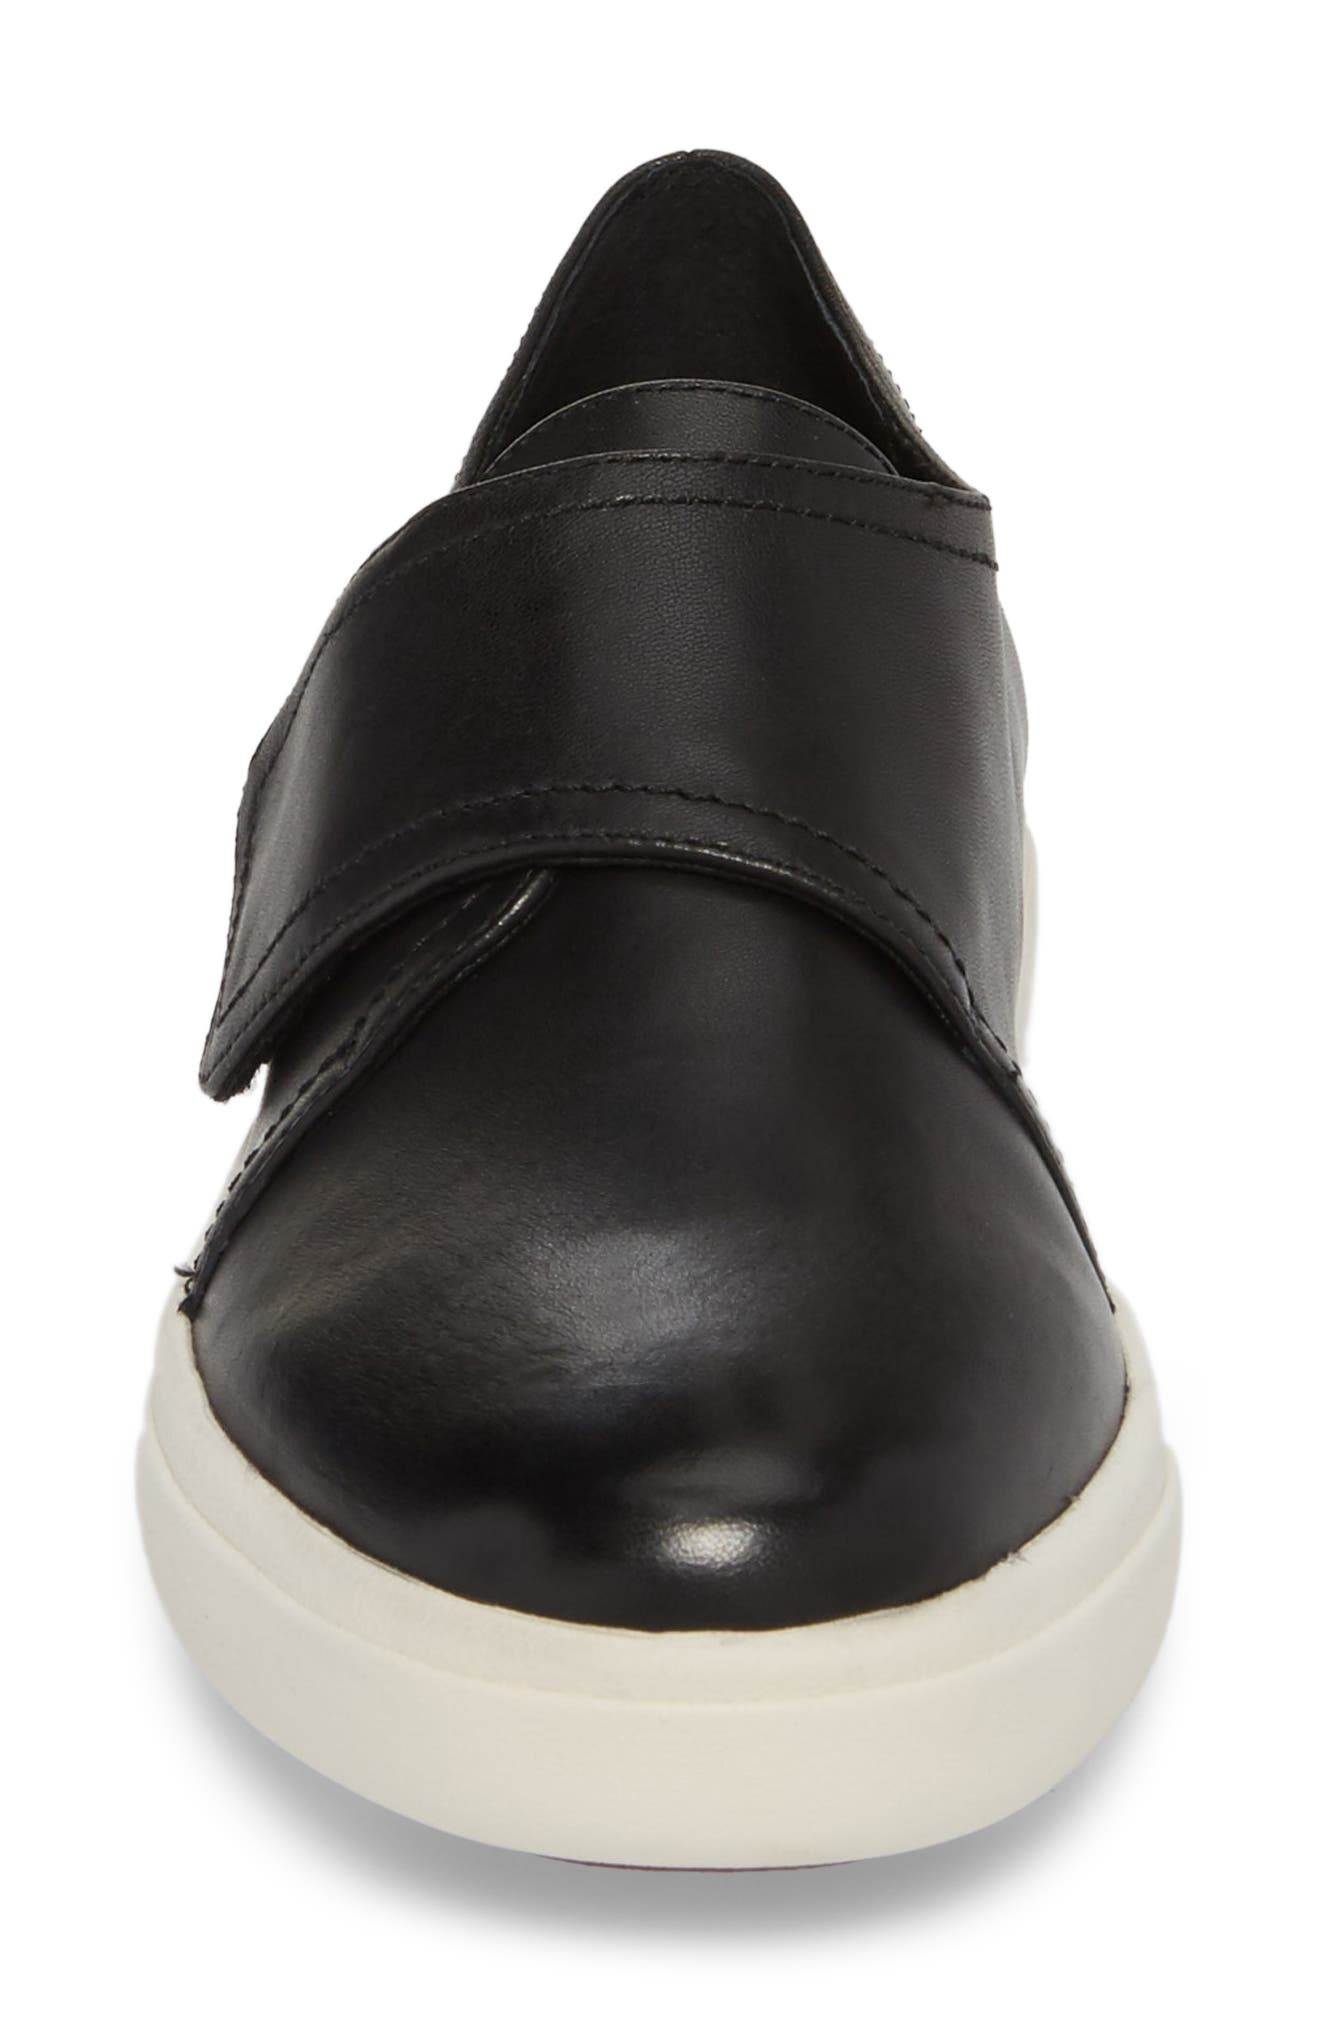 Oberon Slip-On Sneaker,                             Alternate thumbnail 4, color,                             Black Leather